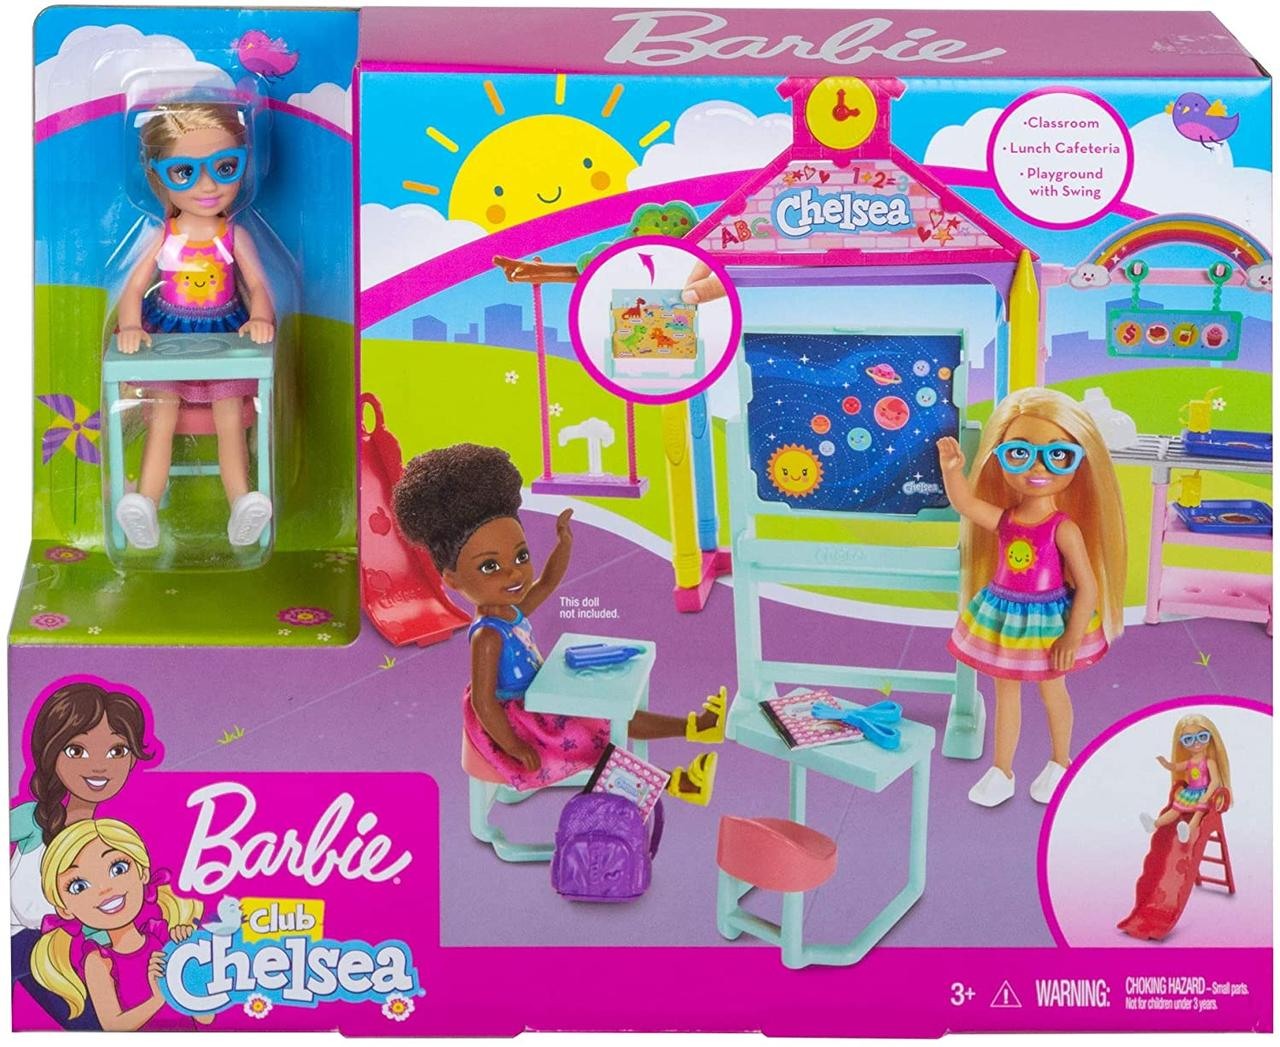 Набор Барби Челси идет в школу Barbie Club Chelsea and School